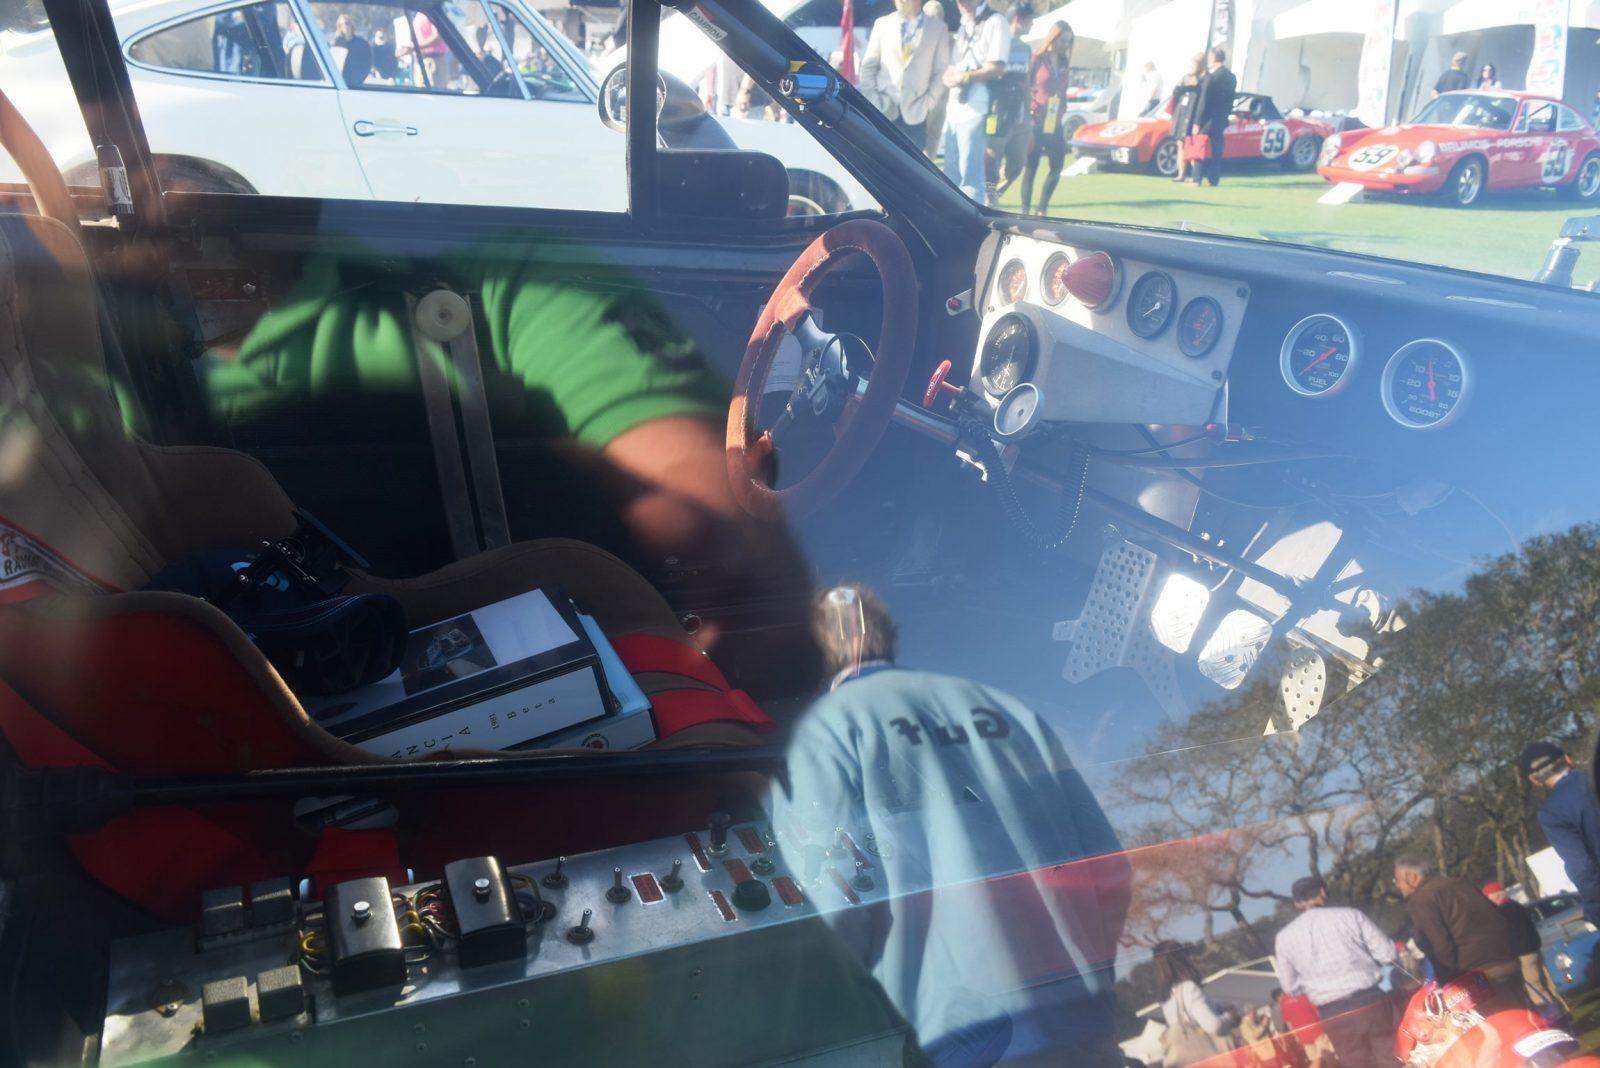 1981 Lancia BETA Monte Carlo Turbo 24